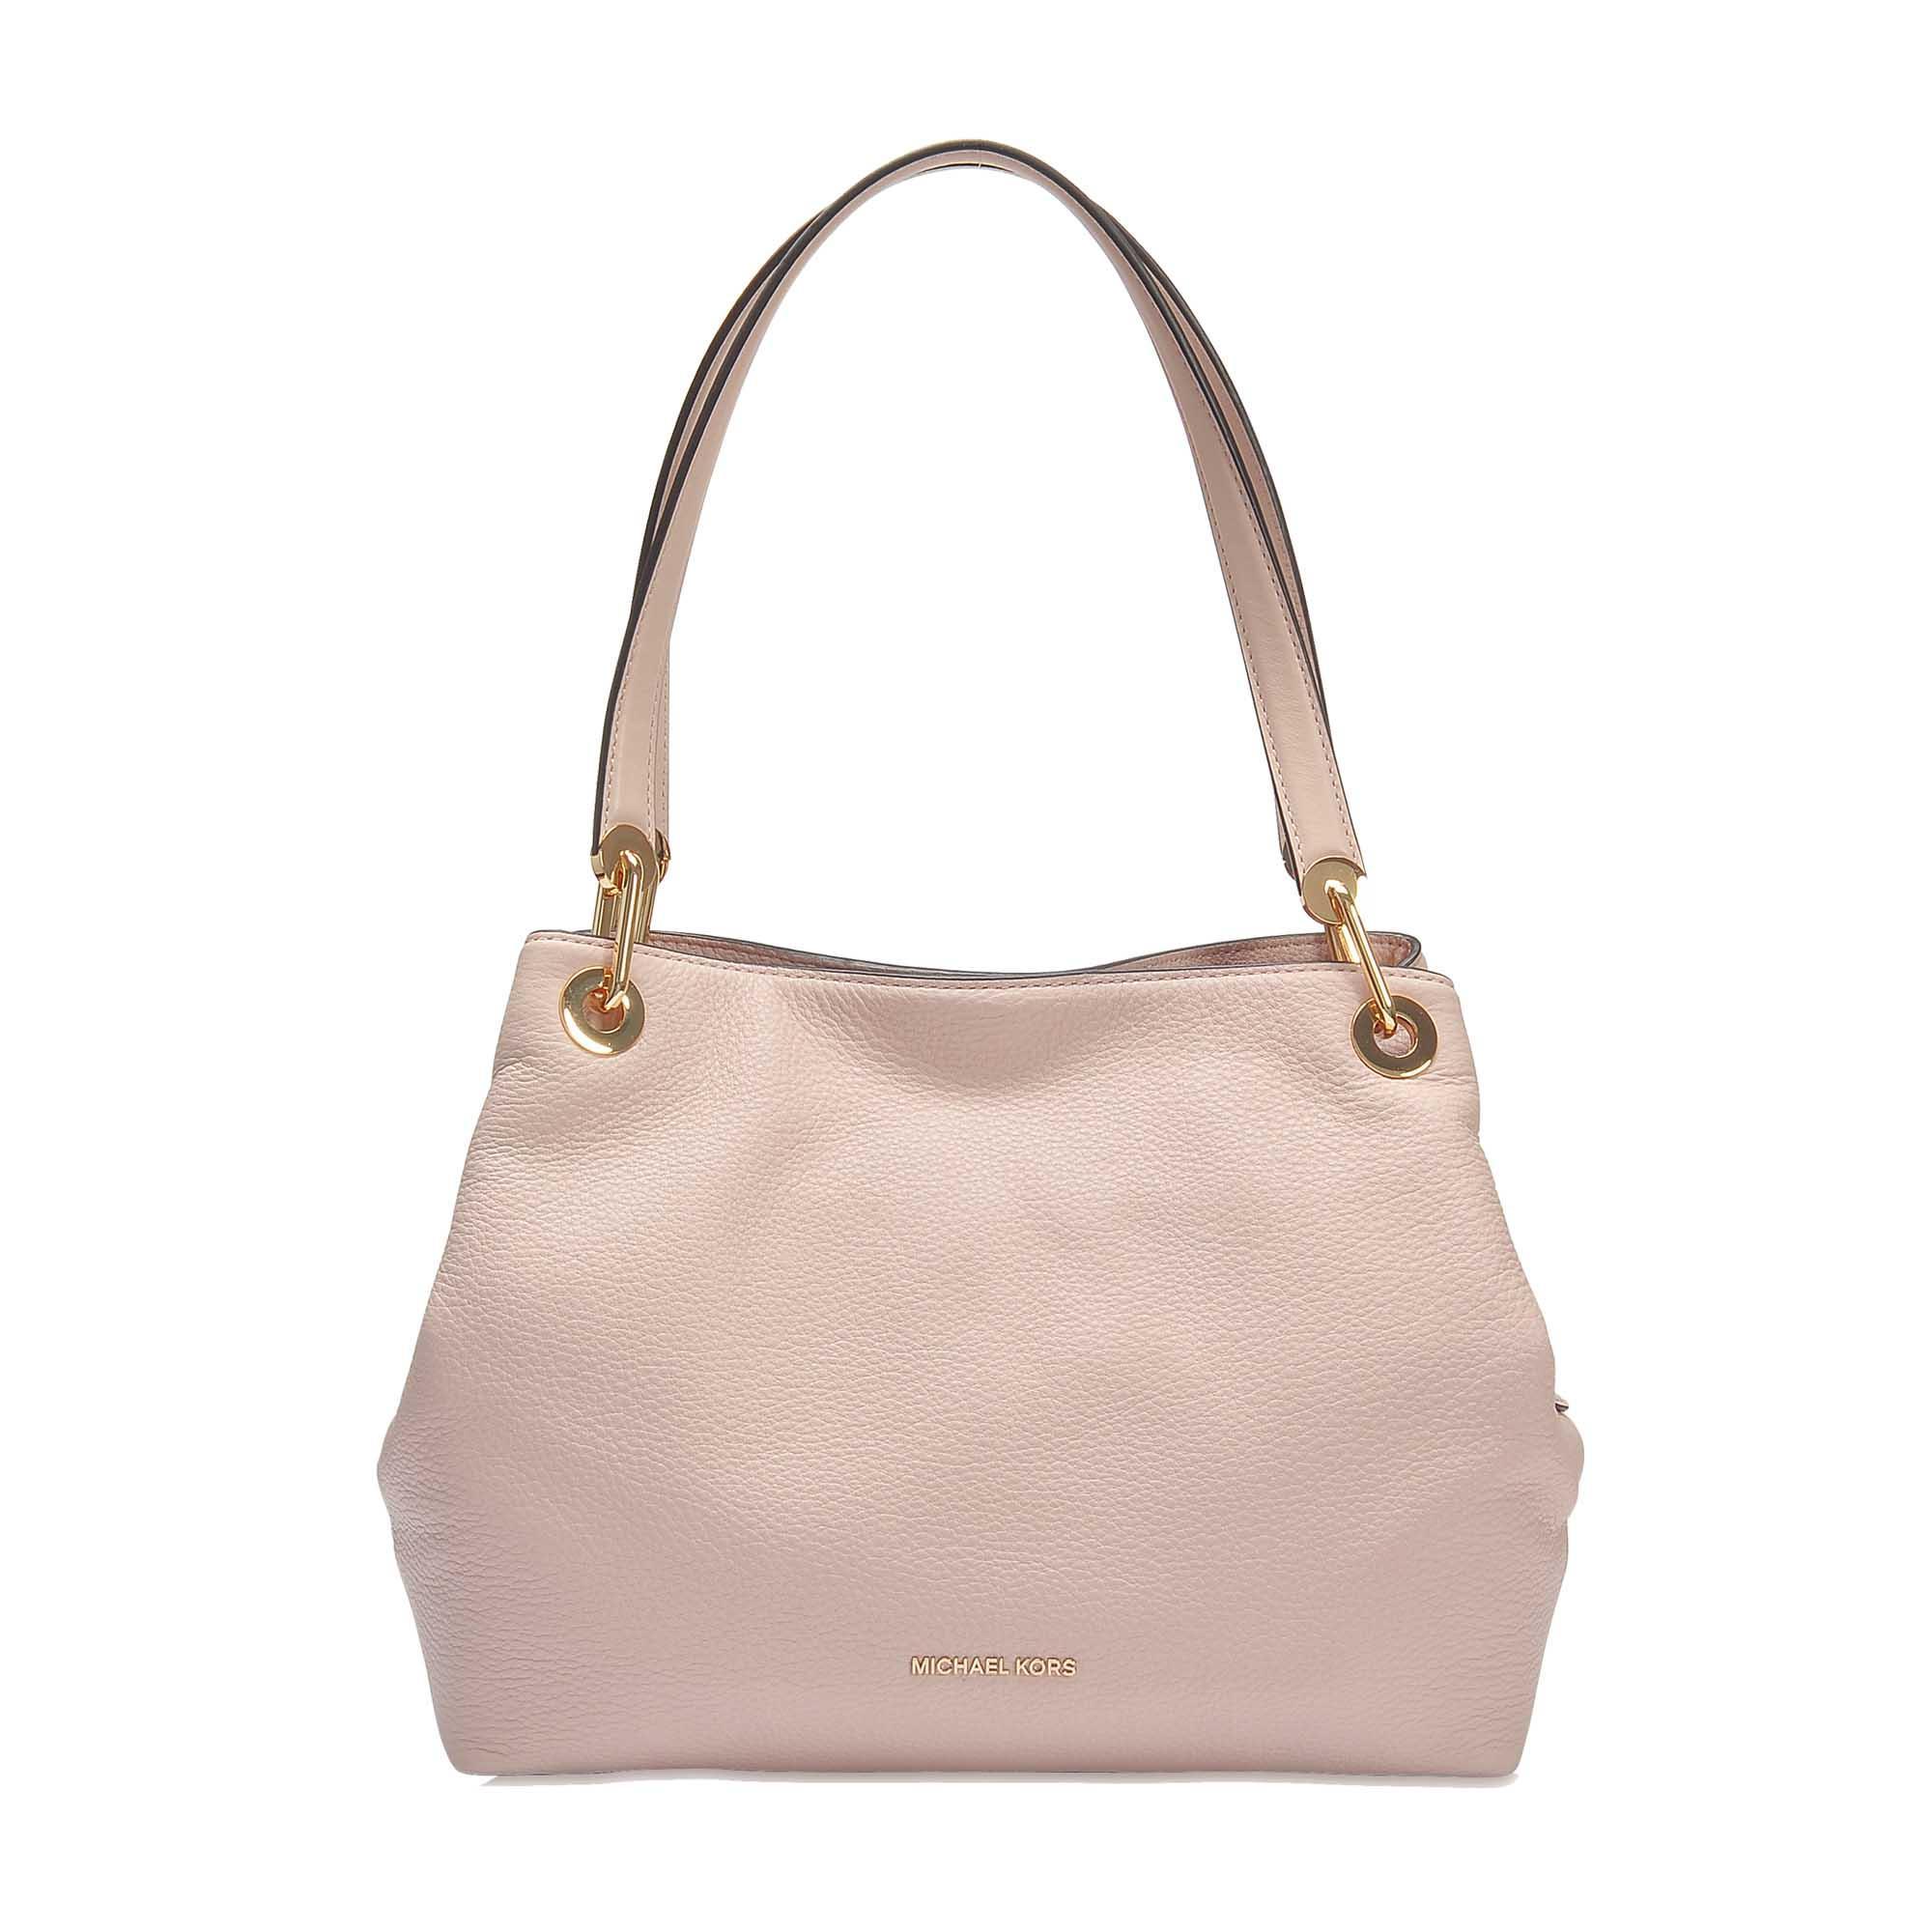 897336d70f12 Michael Michael Kors   Raven Large Shoulder Tote Bag In Black Pebble Leather  In Pink